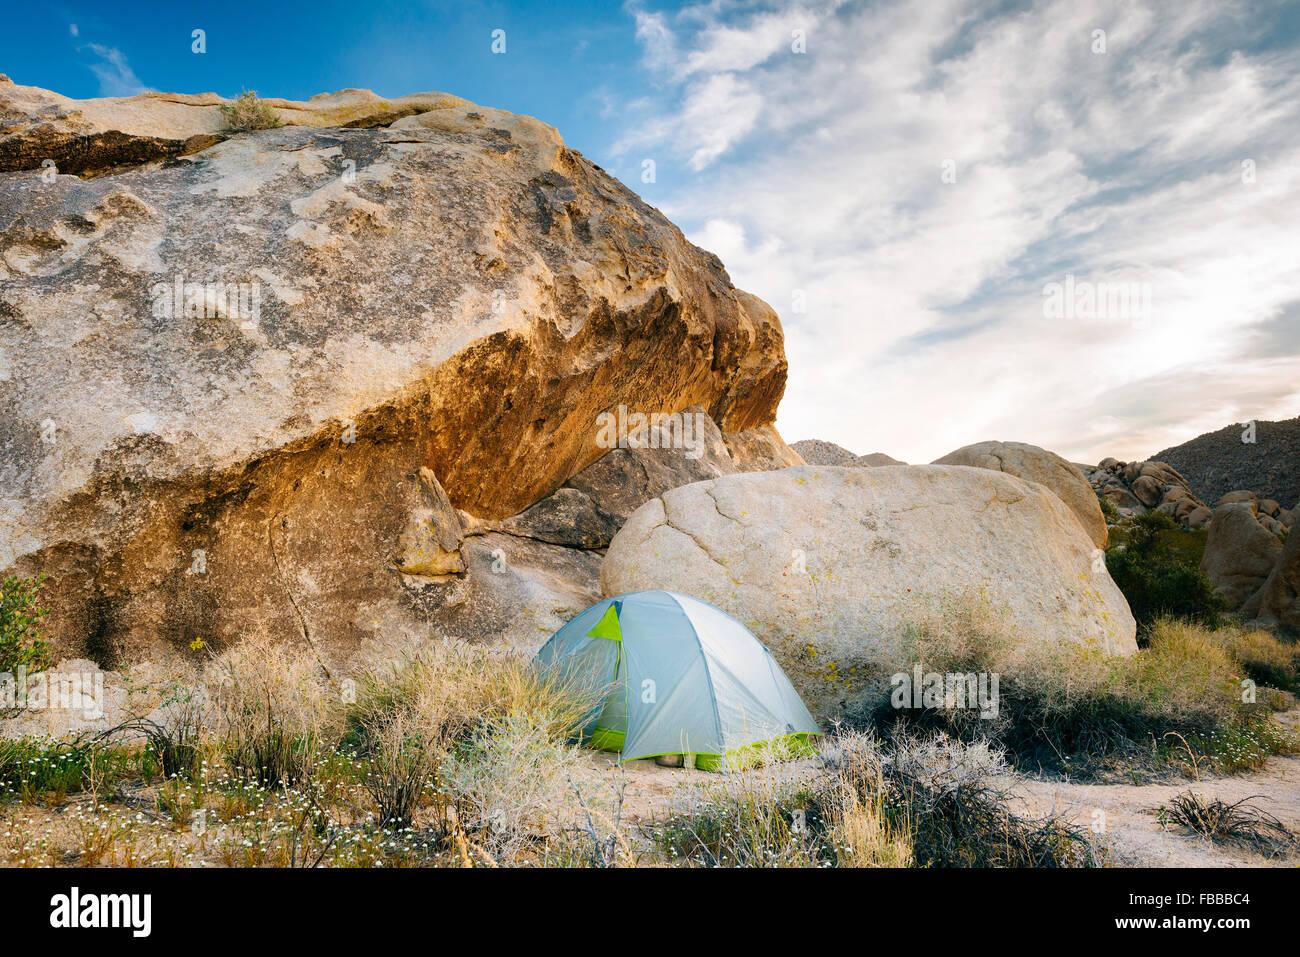 Camping lungo il Boy Scout Trail in Wonderland di Rocks, Joshua Tree National Park, California Immagini Stock